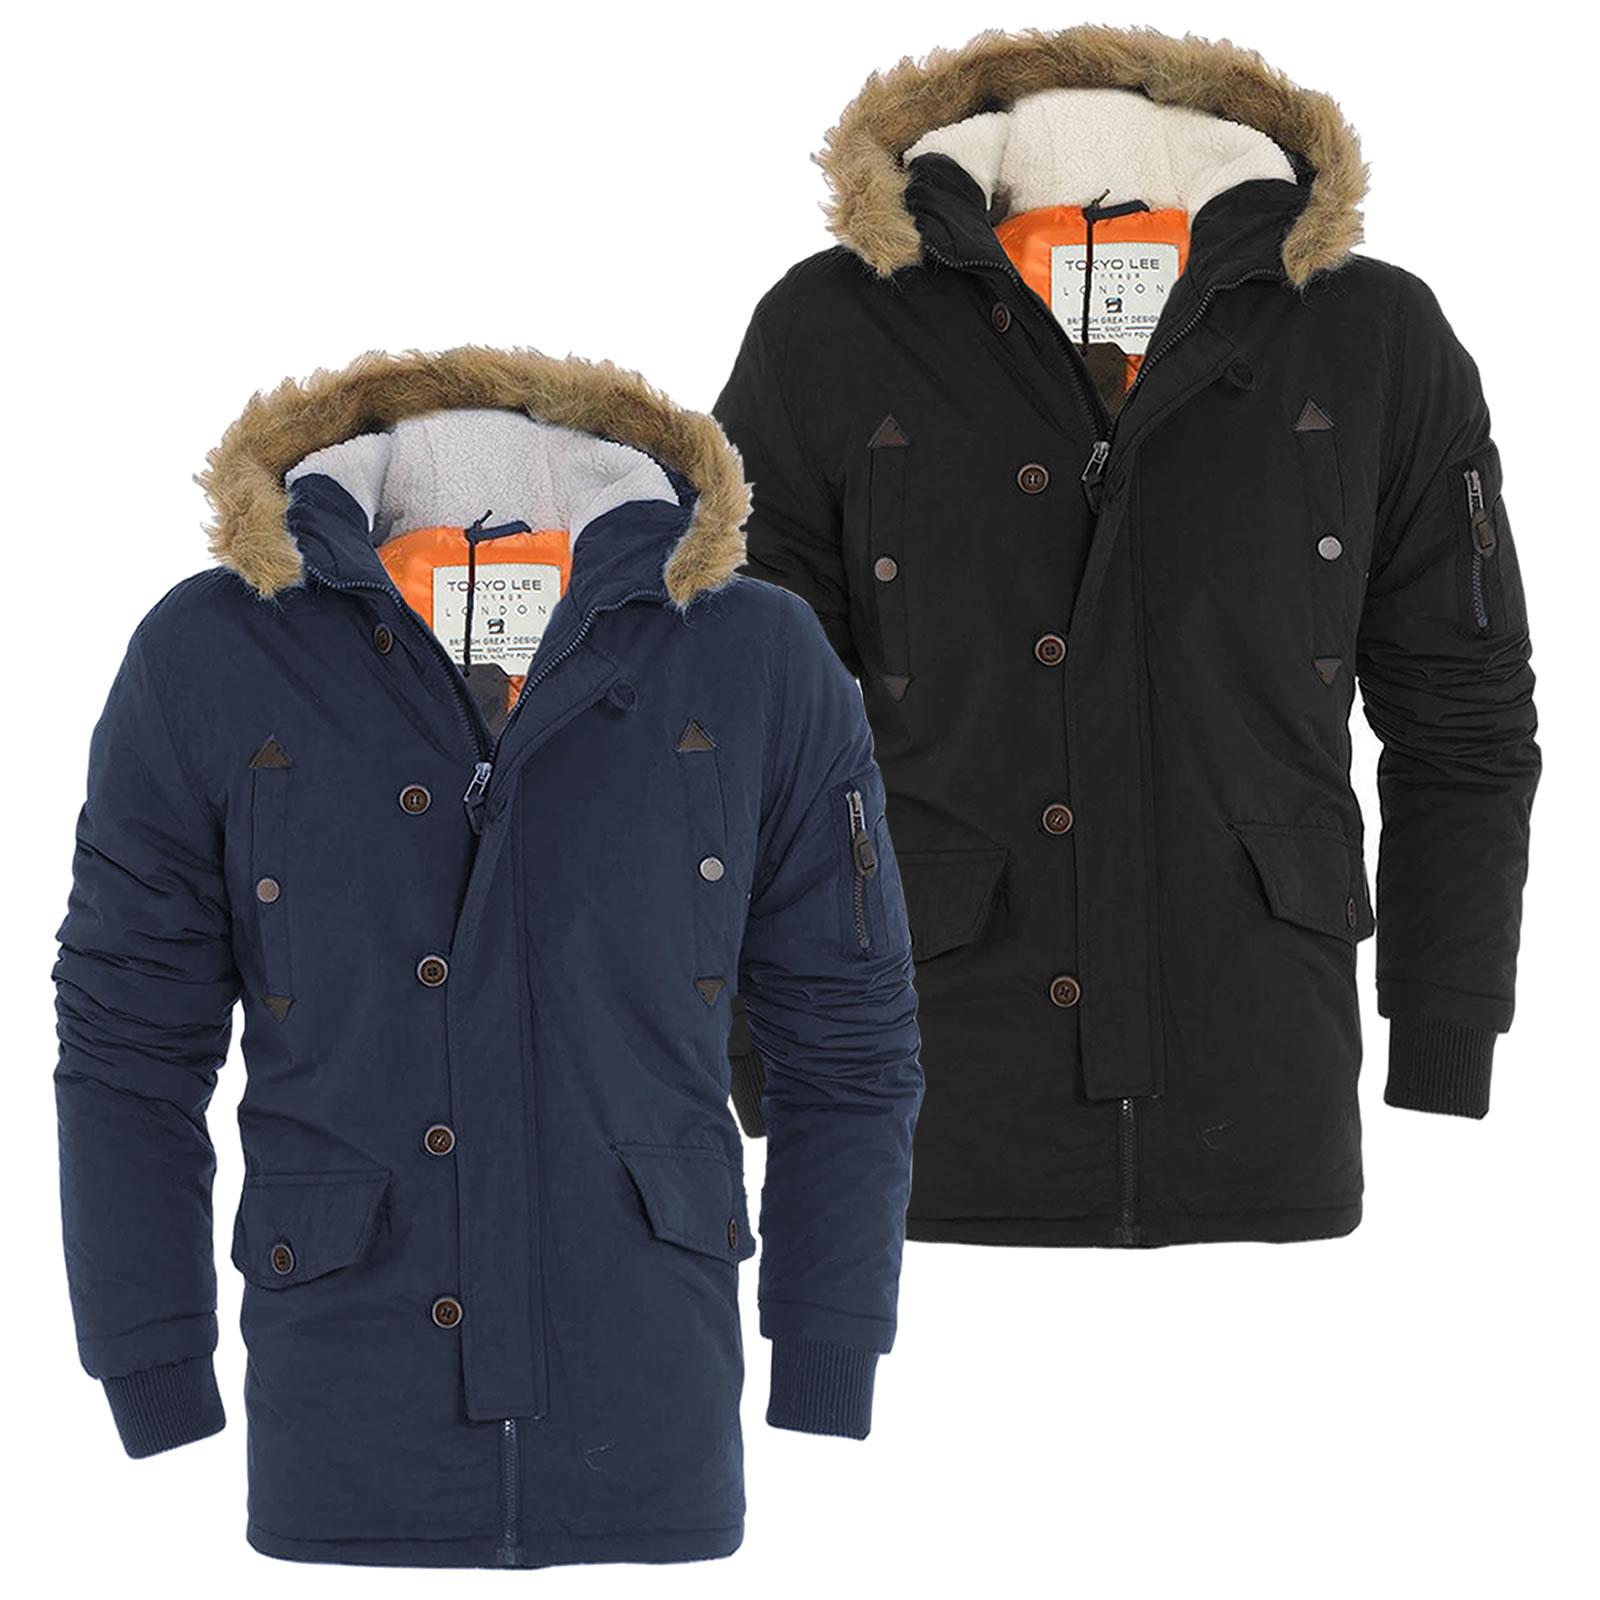 6f9ed534aae7 Cameron Parka Coat With Fur Trim Hood In Black Tokyo Laundry. Mens Real Fur  Parka Welovefurs